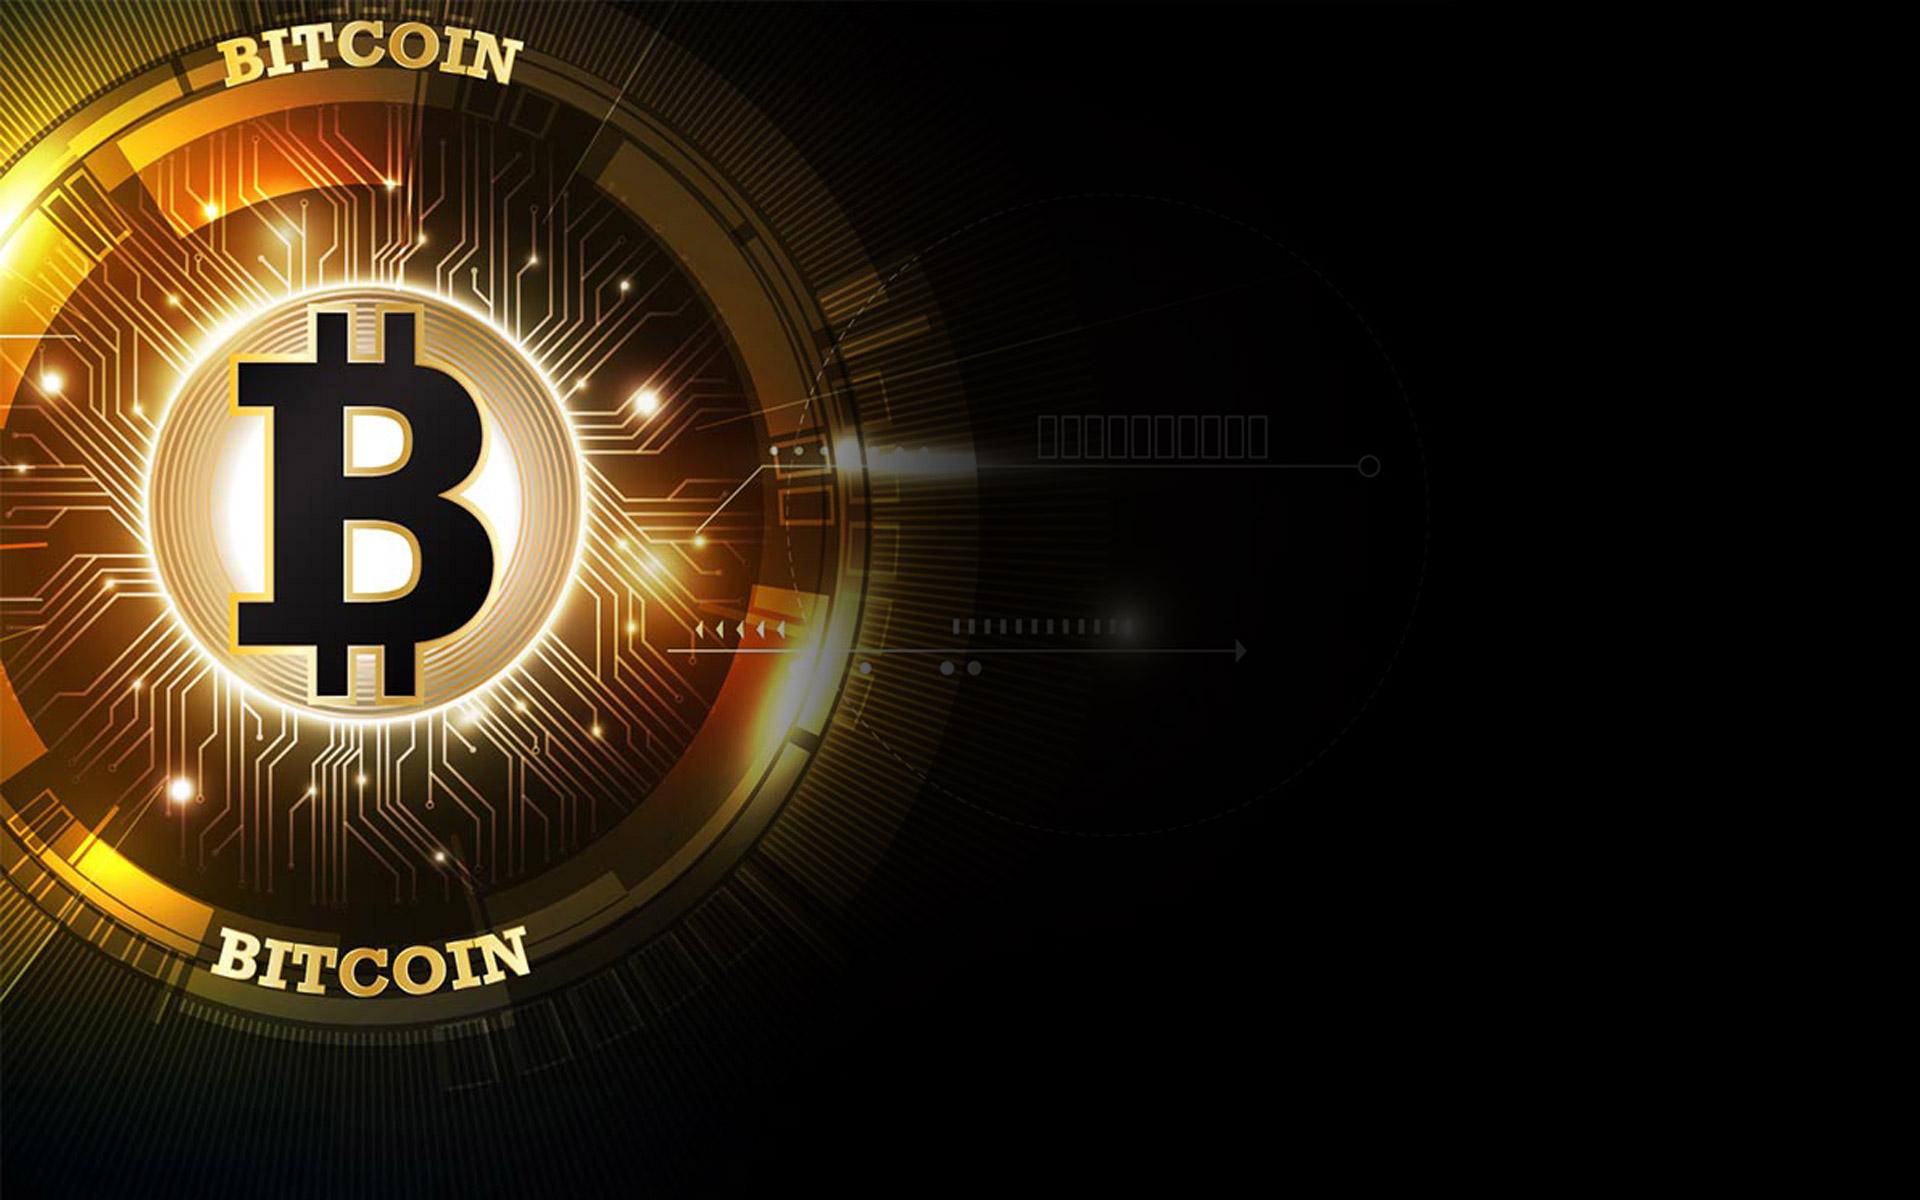 Bitcoin Onlinebroker